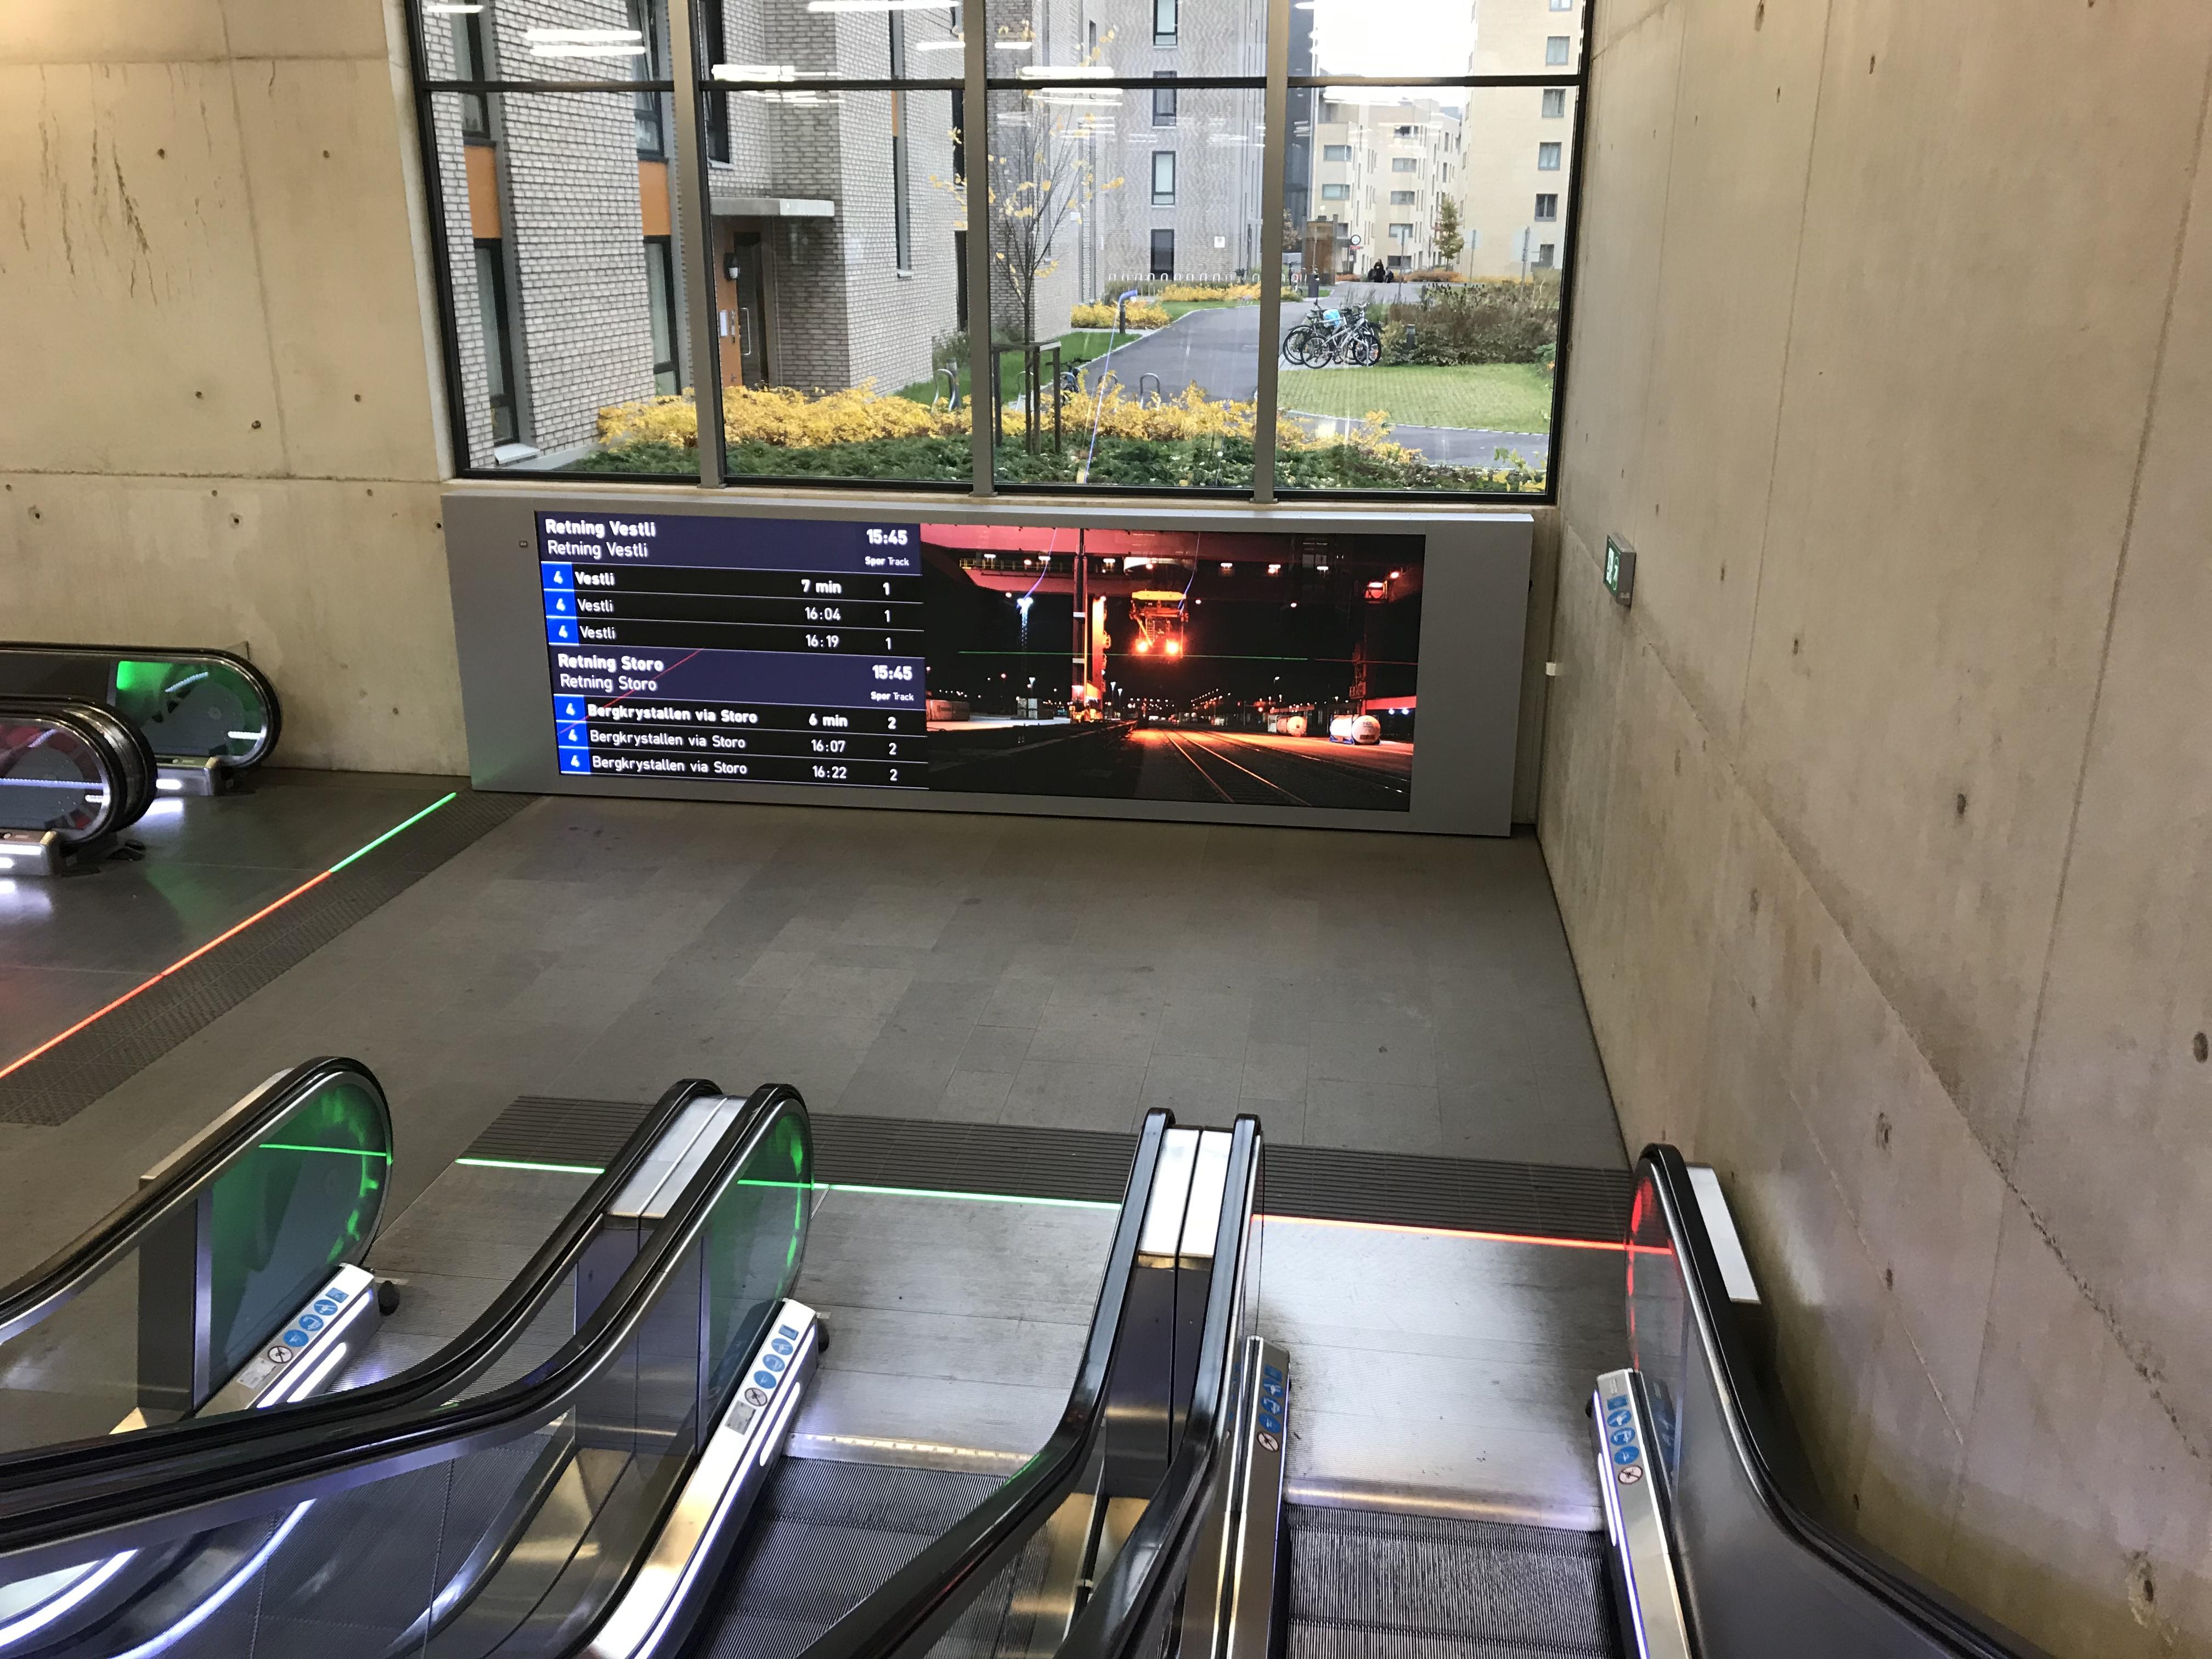 Oslo 1, work, installed at Løren T-bane stop 2020